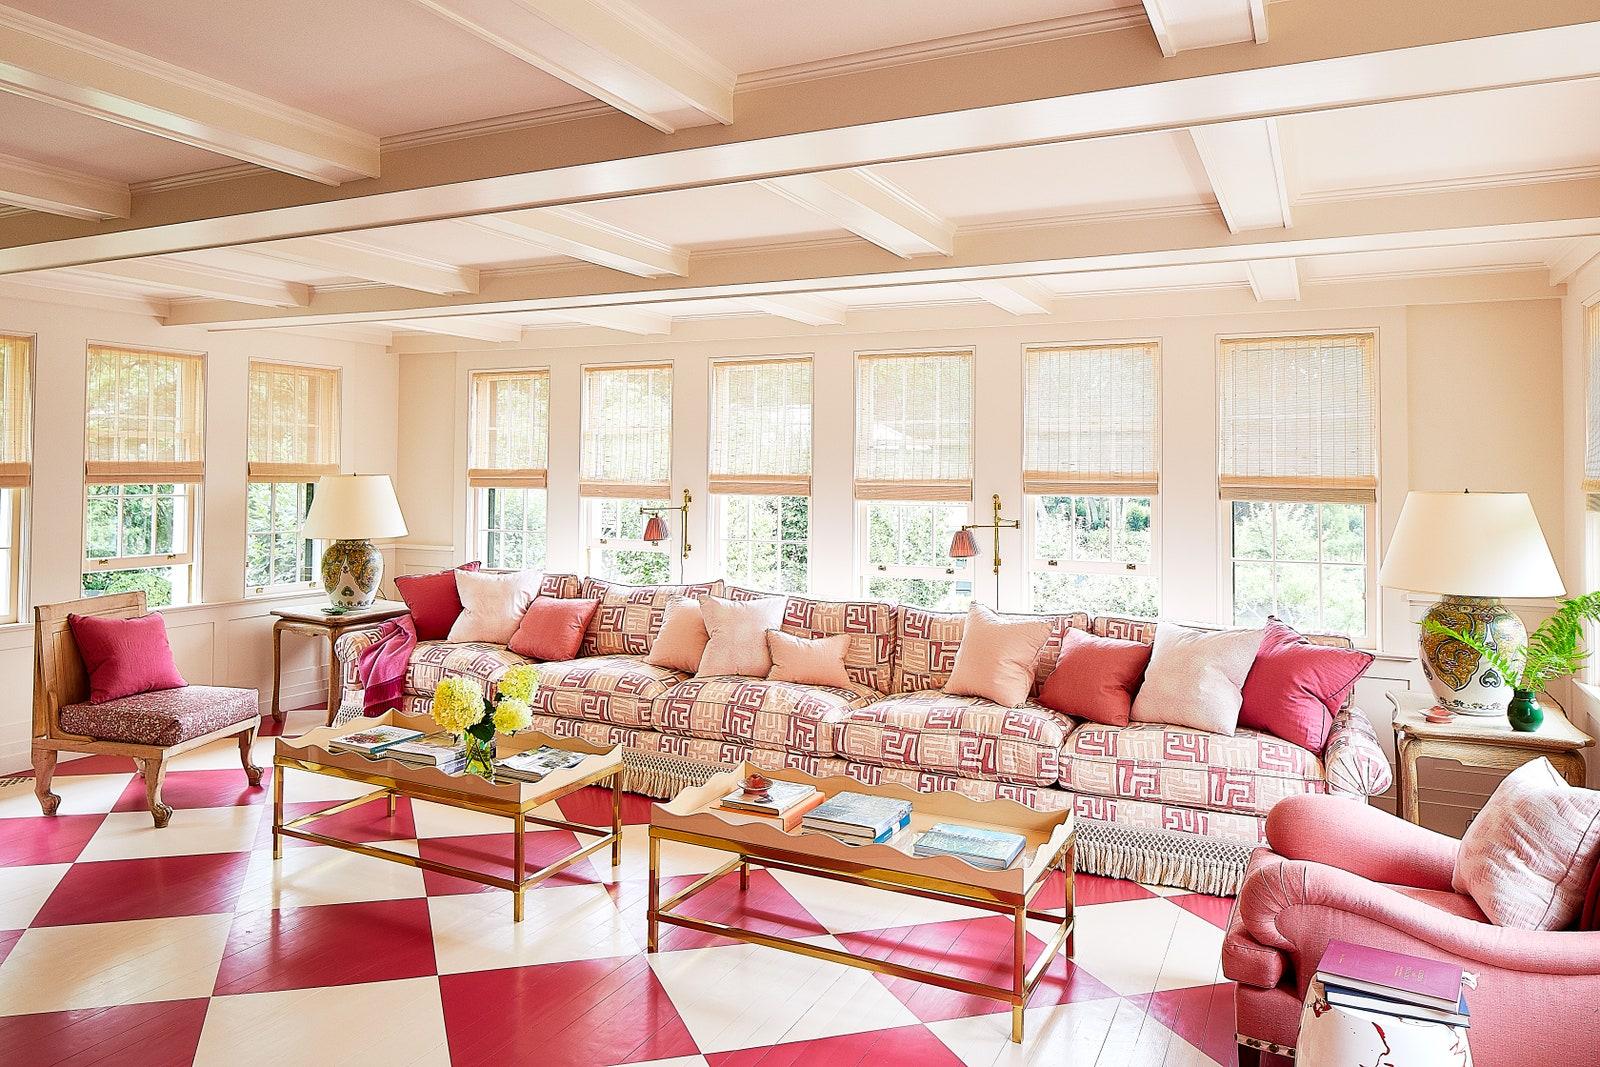 KRB_Hamptons_Home_fchicbymeg